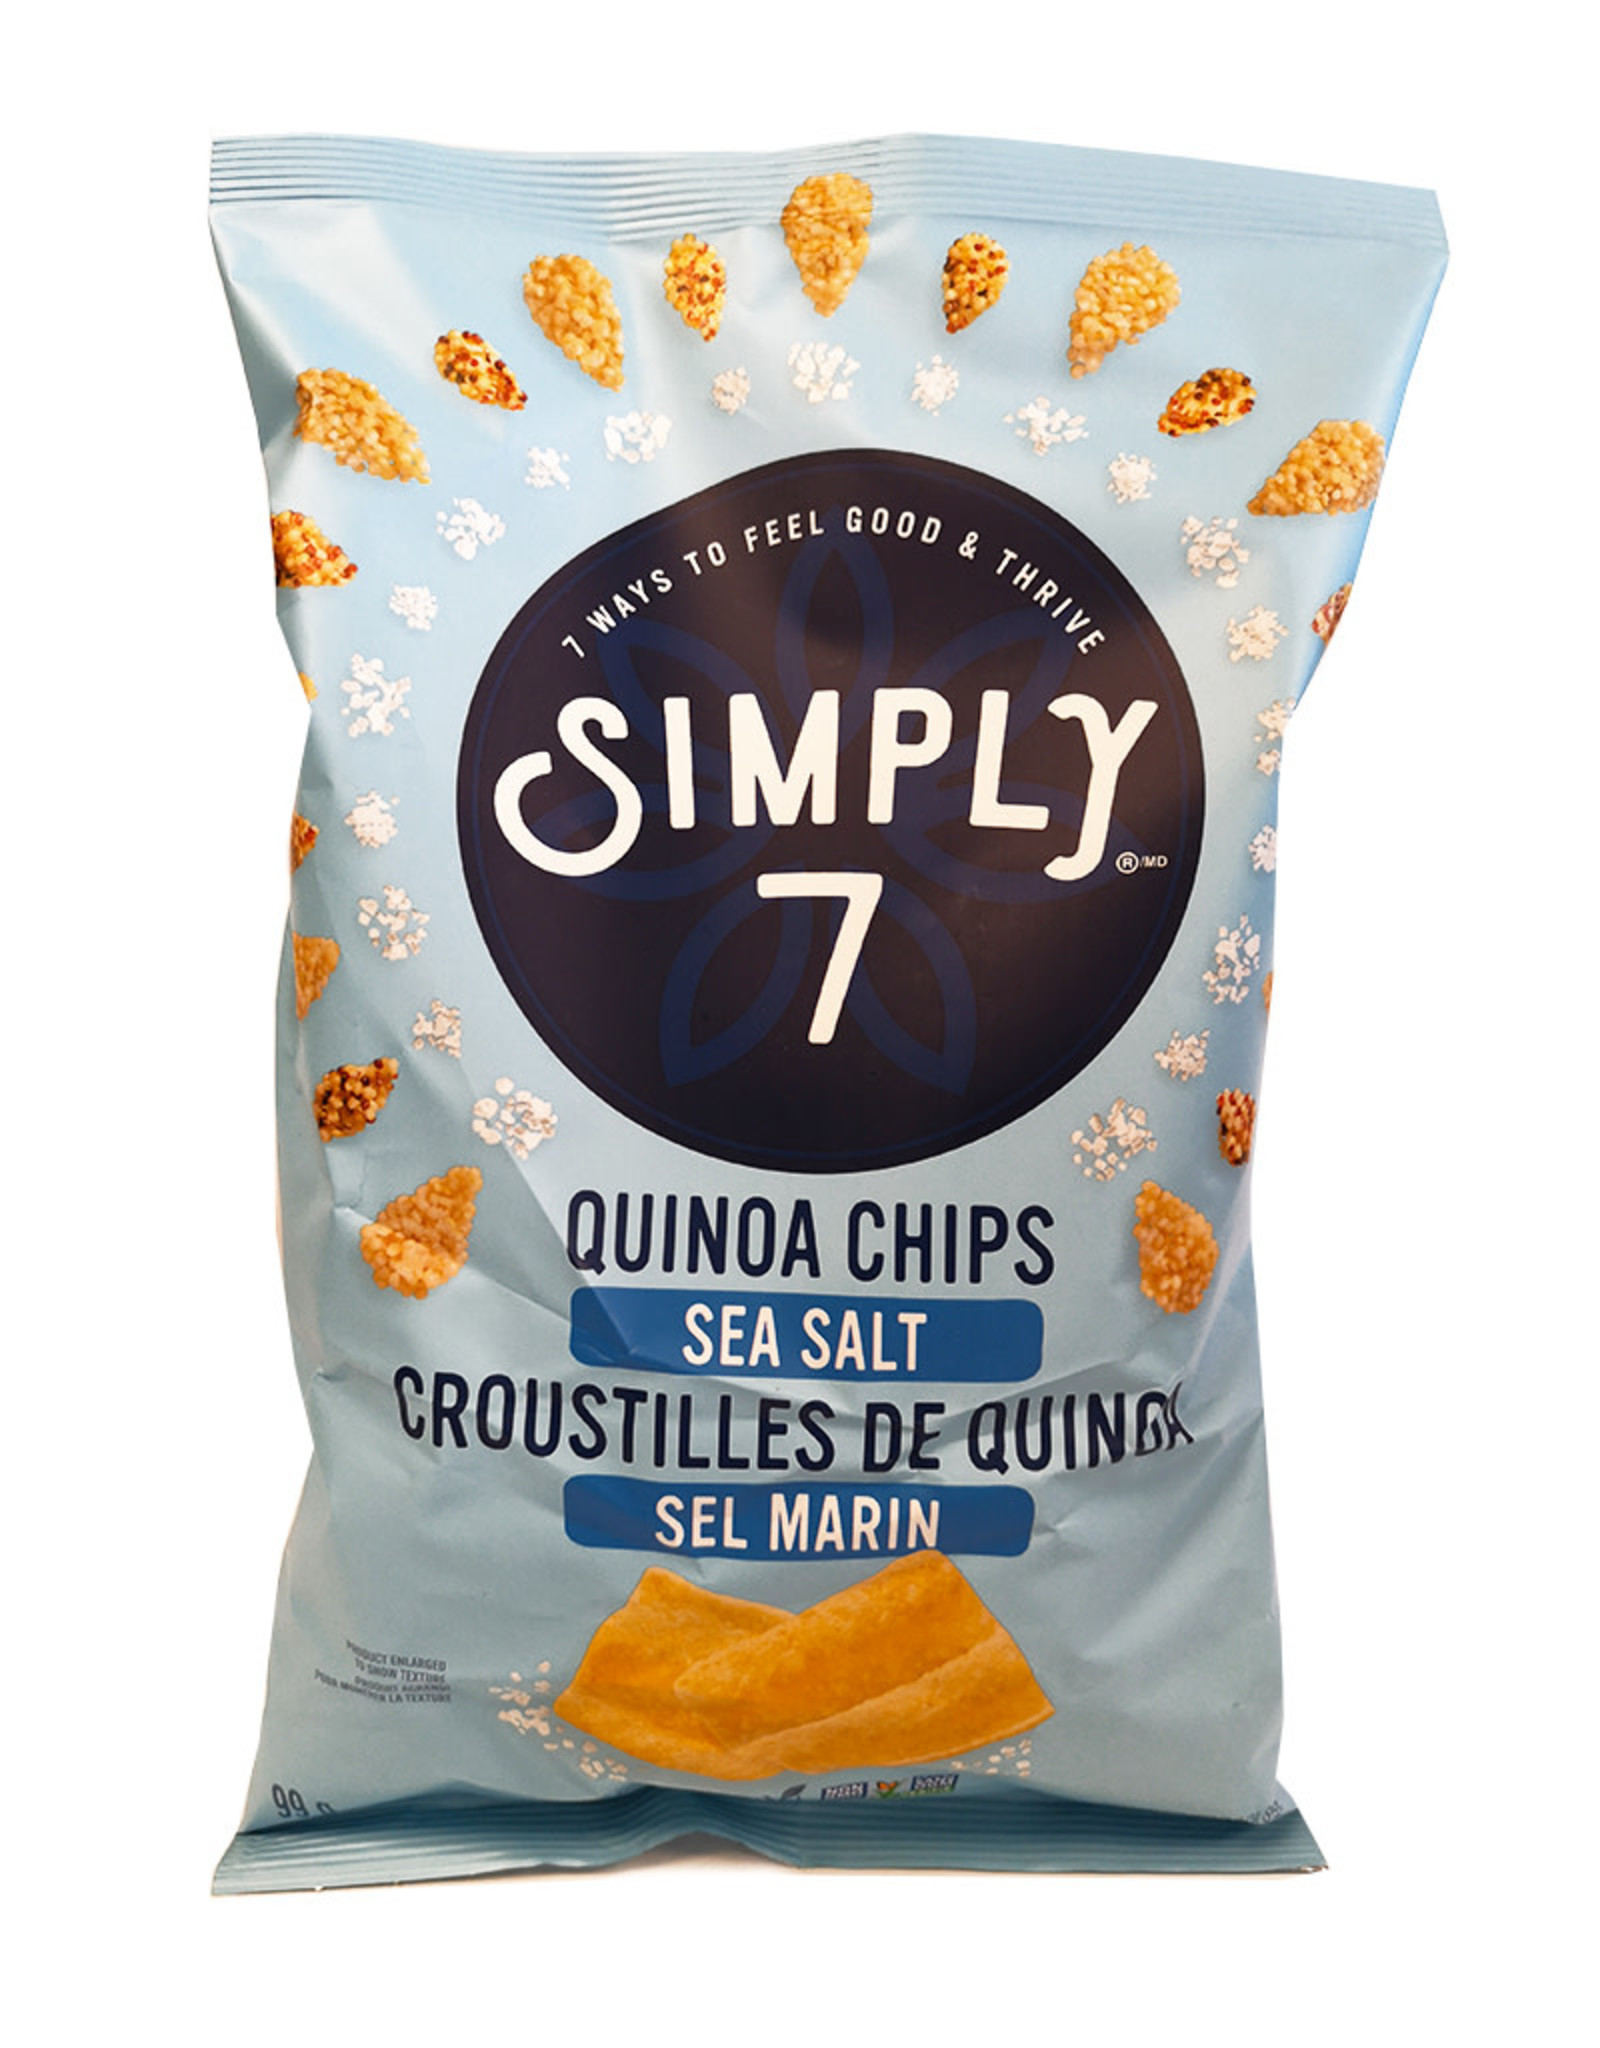 Simply 7 Simply 7 - Quinoa Chips, Sea Salt (99g)